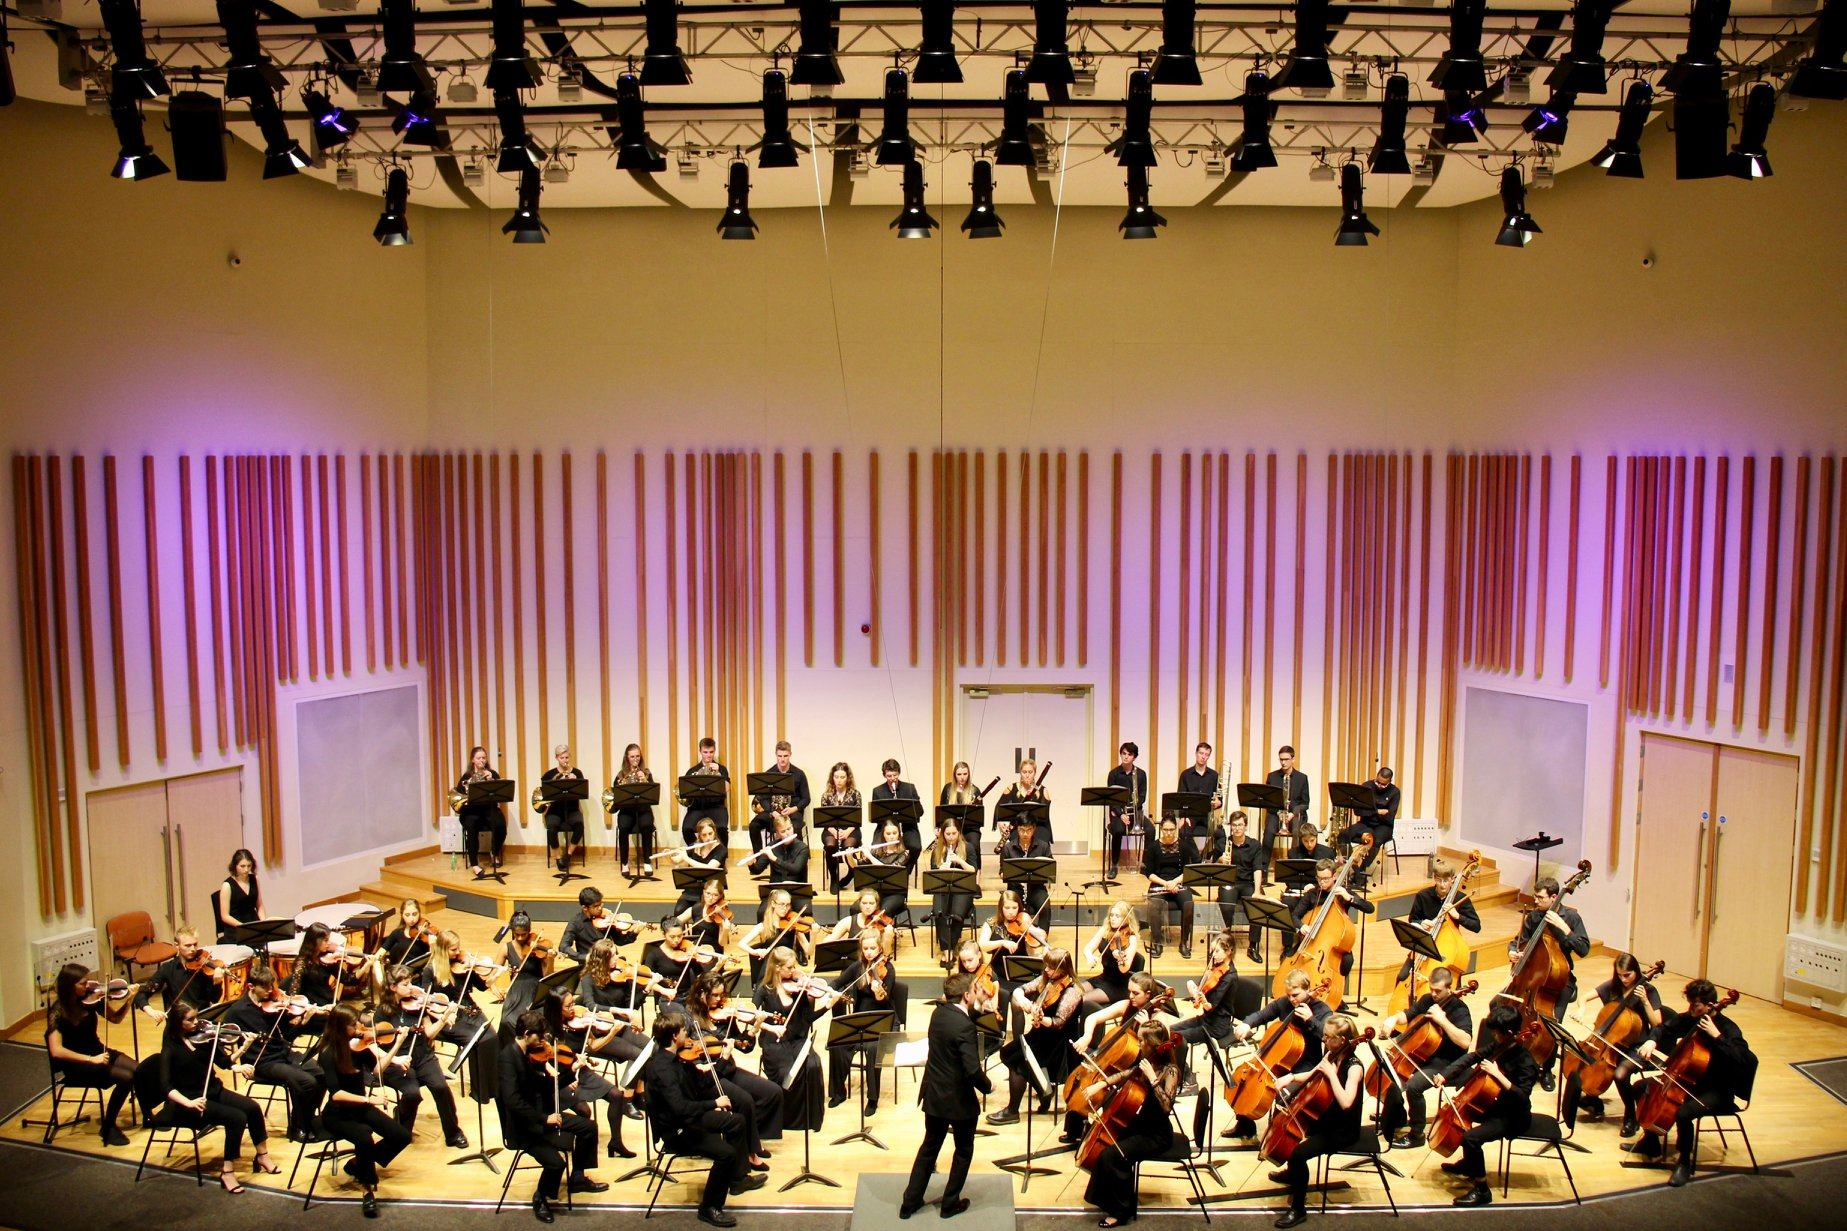 A concert at the Martin Harris Centre